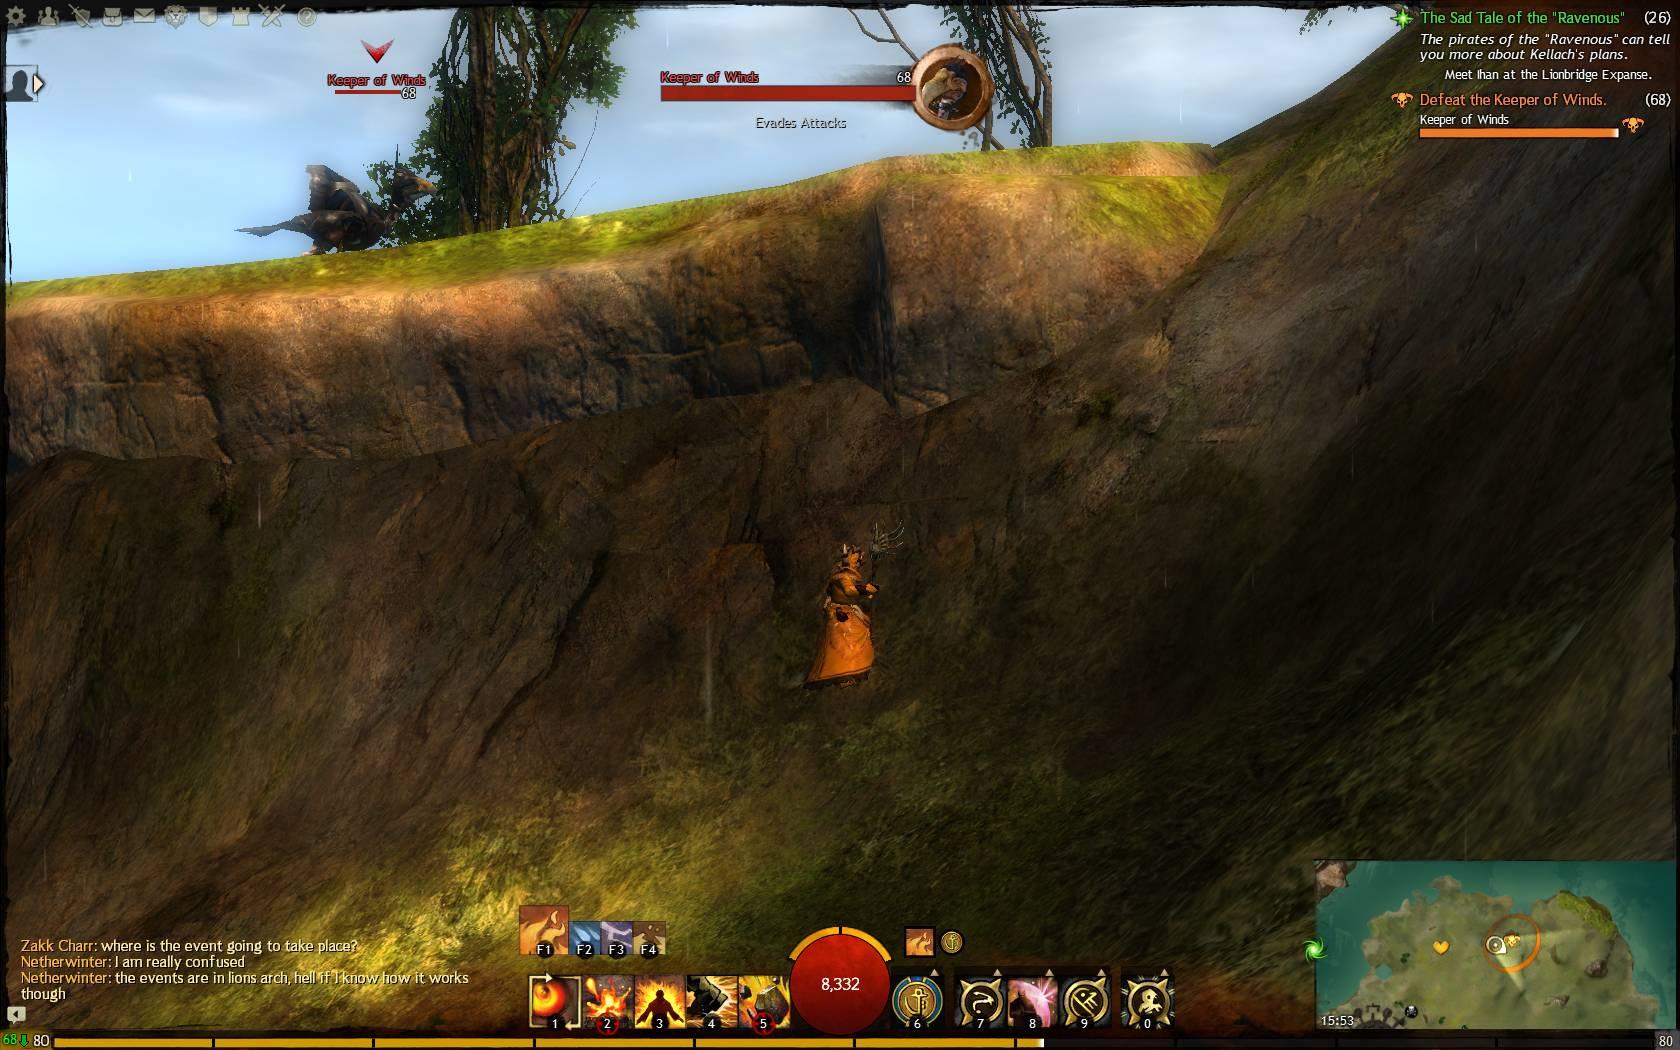 Hidden_Garden_Jumping_Puzzle_keeper_Of_wind (1) - Guild Wars 2 Life